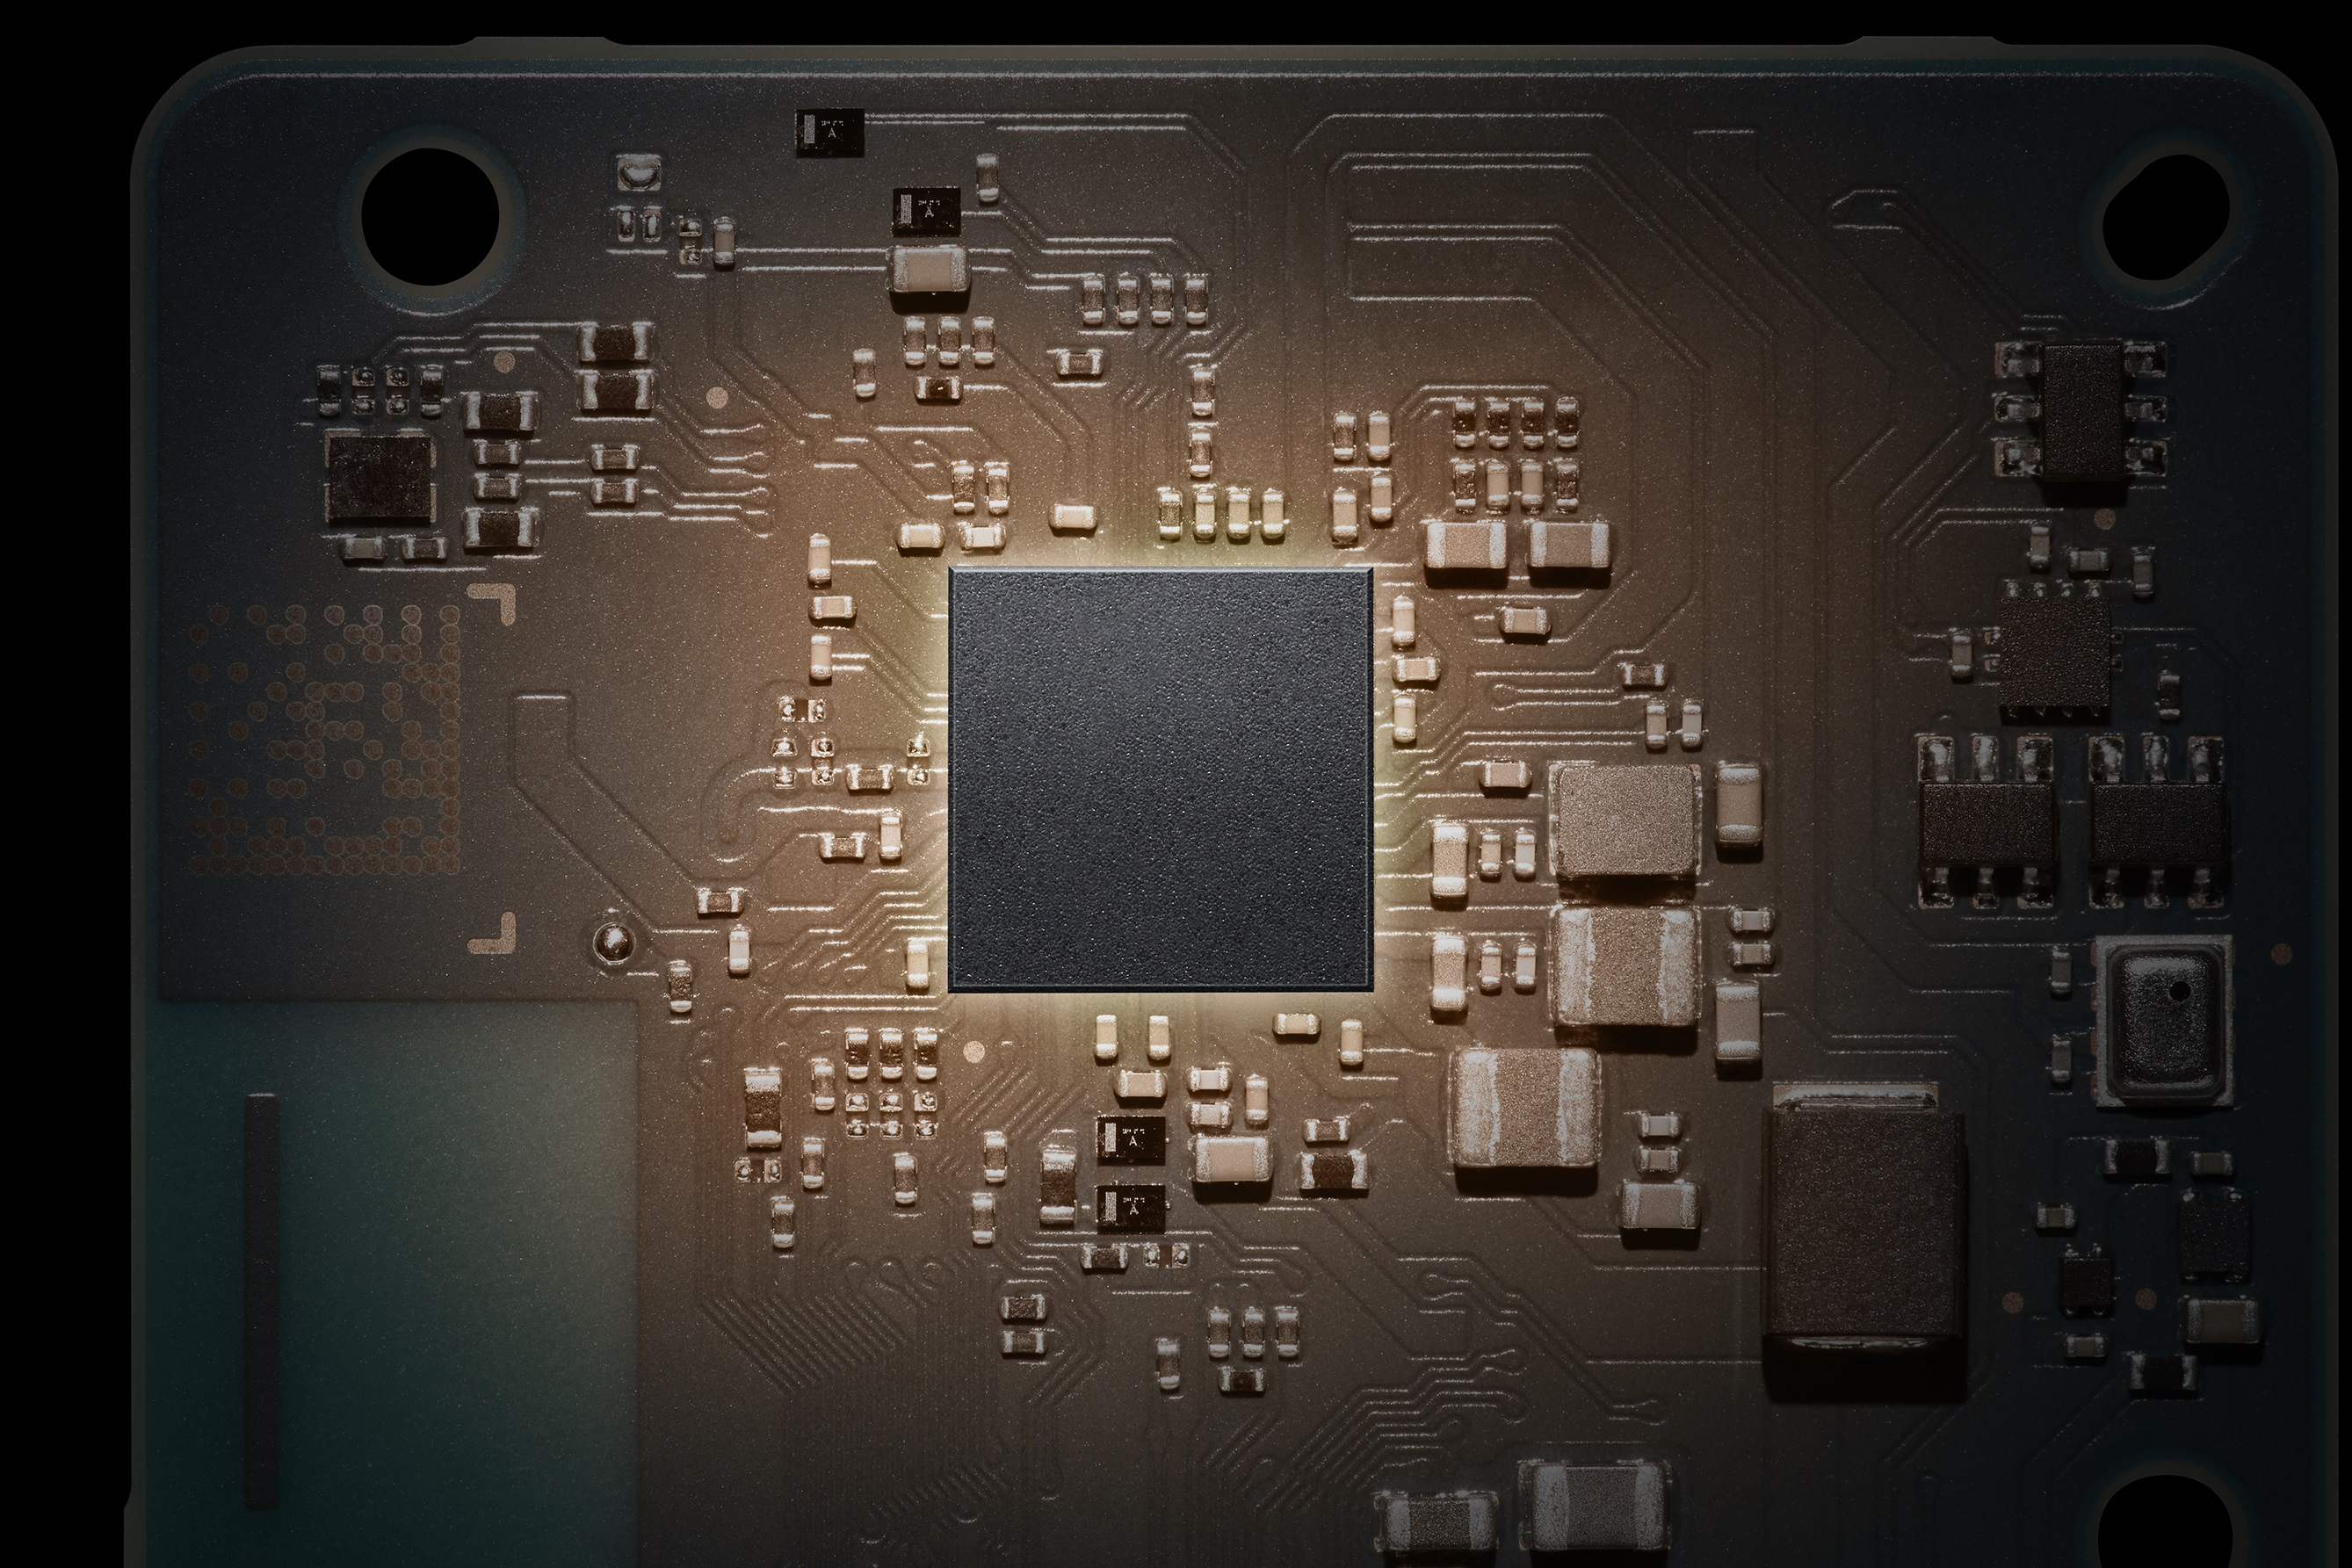 WH-1000XM4_Bluetooth_Audio_SoC